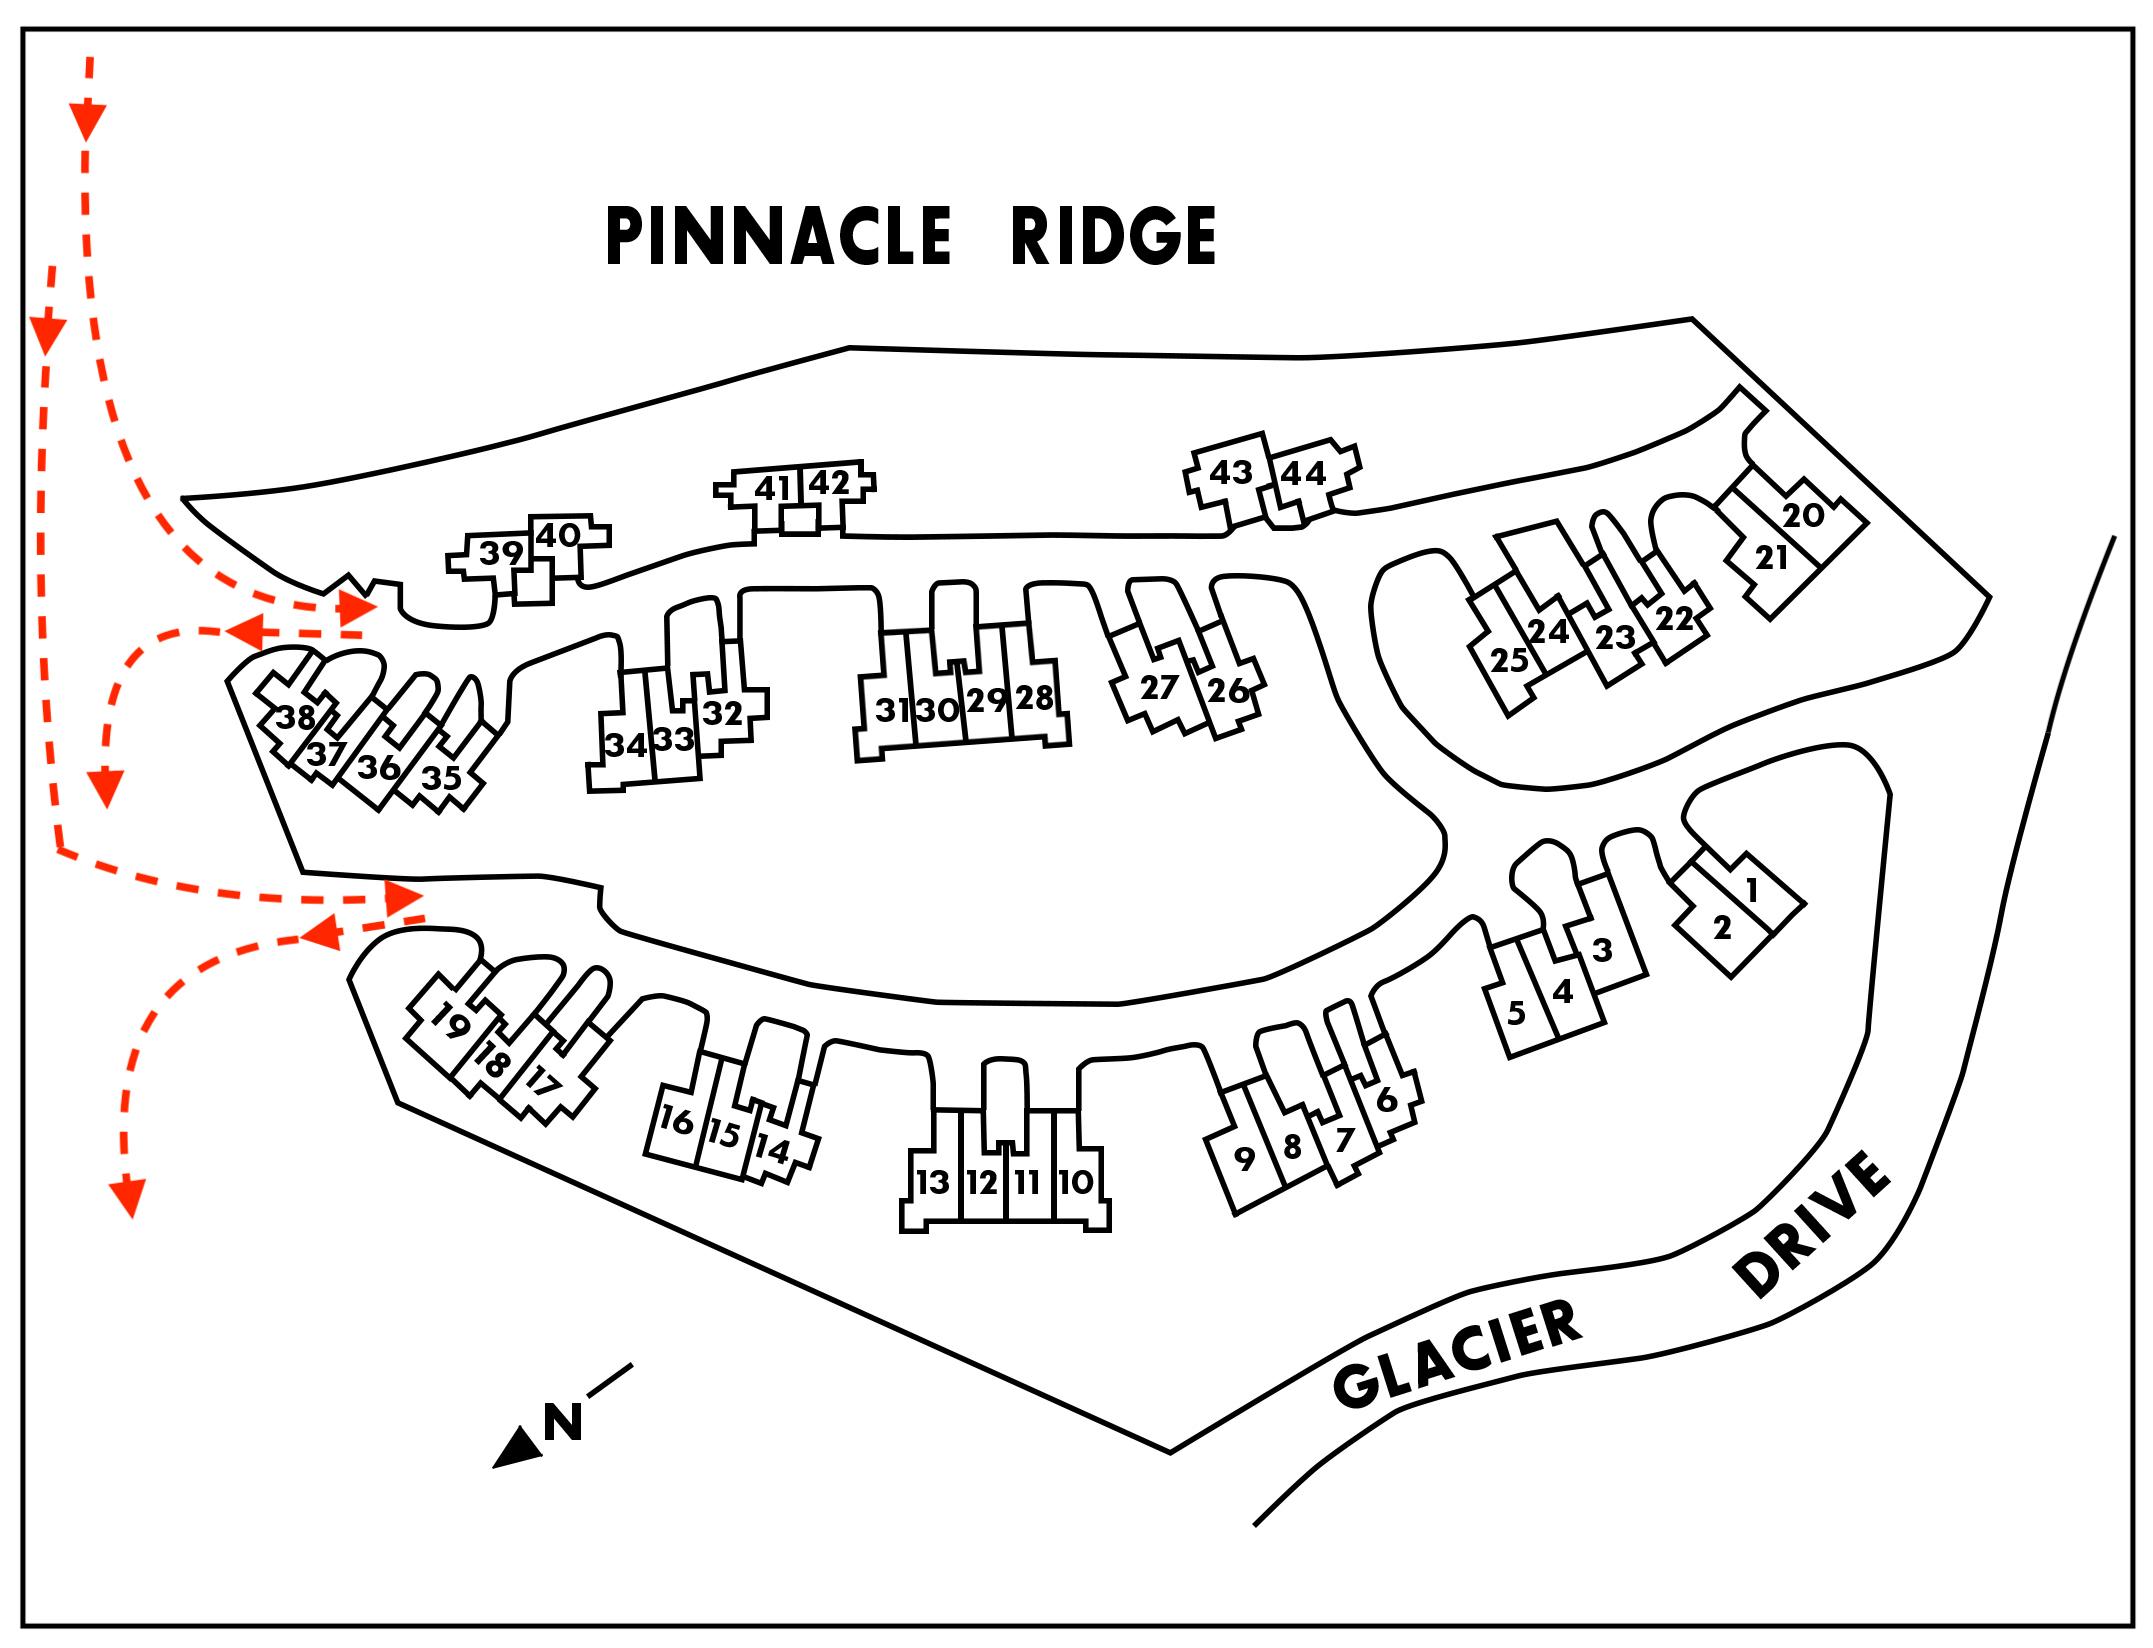 trail map showing Pinnacle-Ridge ski trails to all properties 1-44